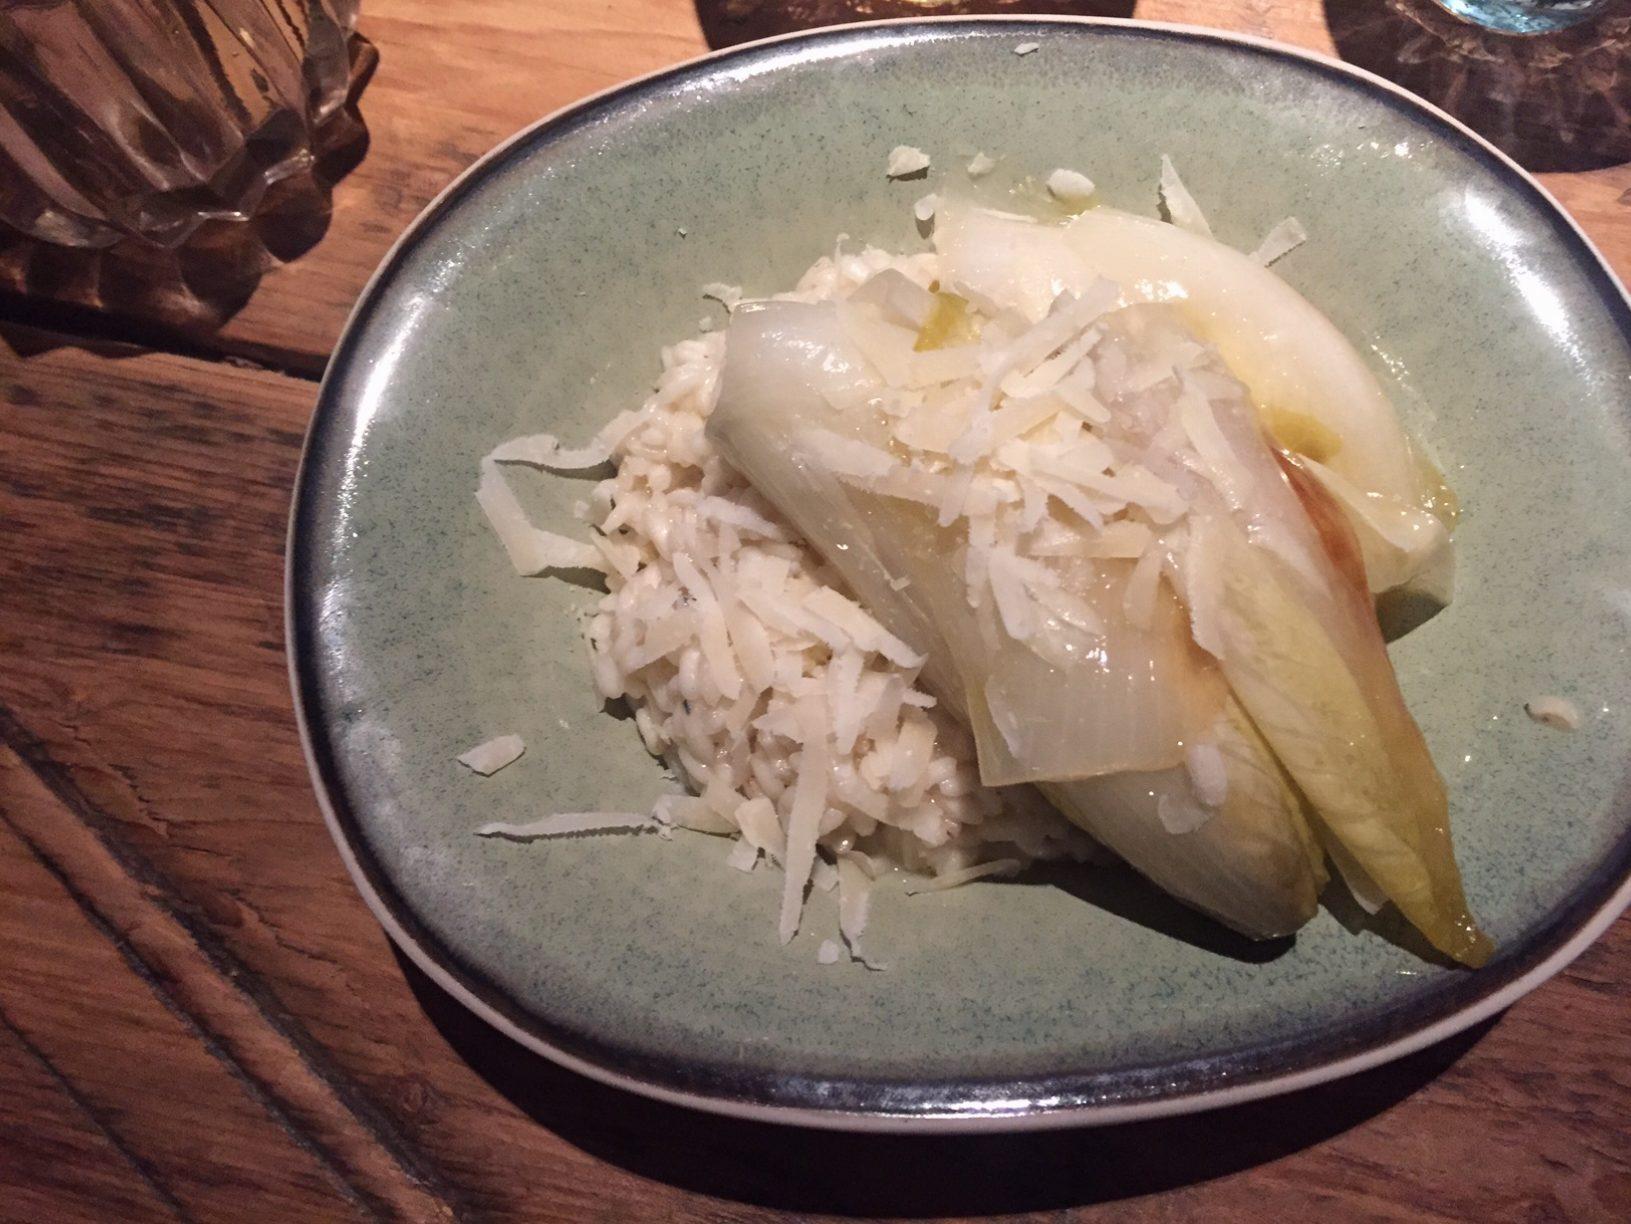 gorgonzola risotto met balsamico witlof recept van foodblog Foodinista